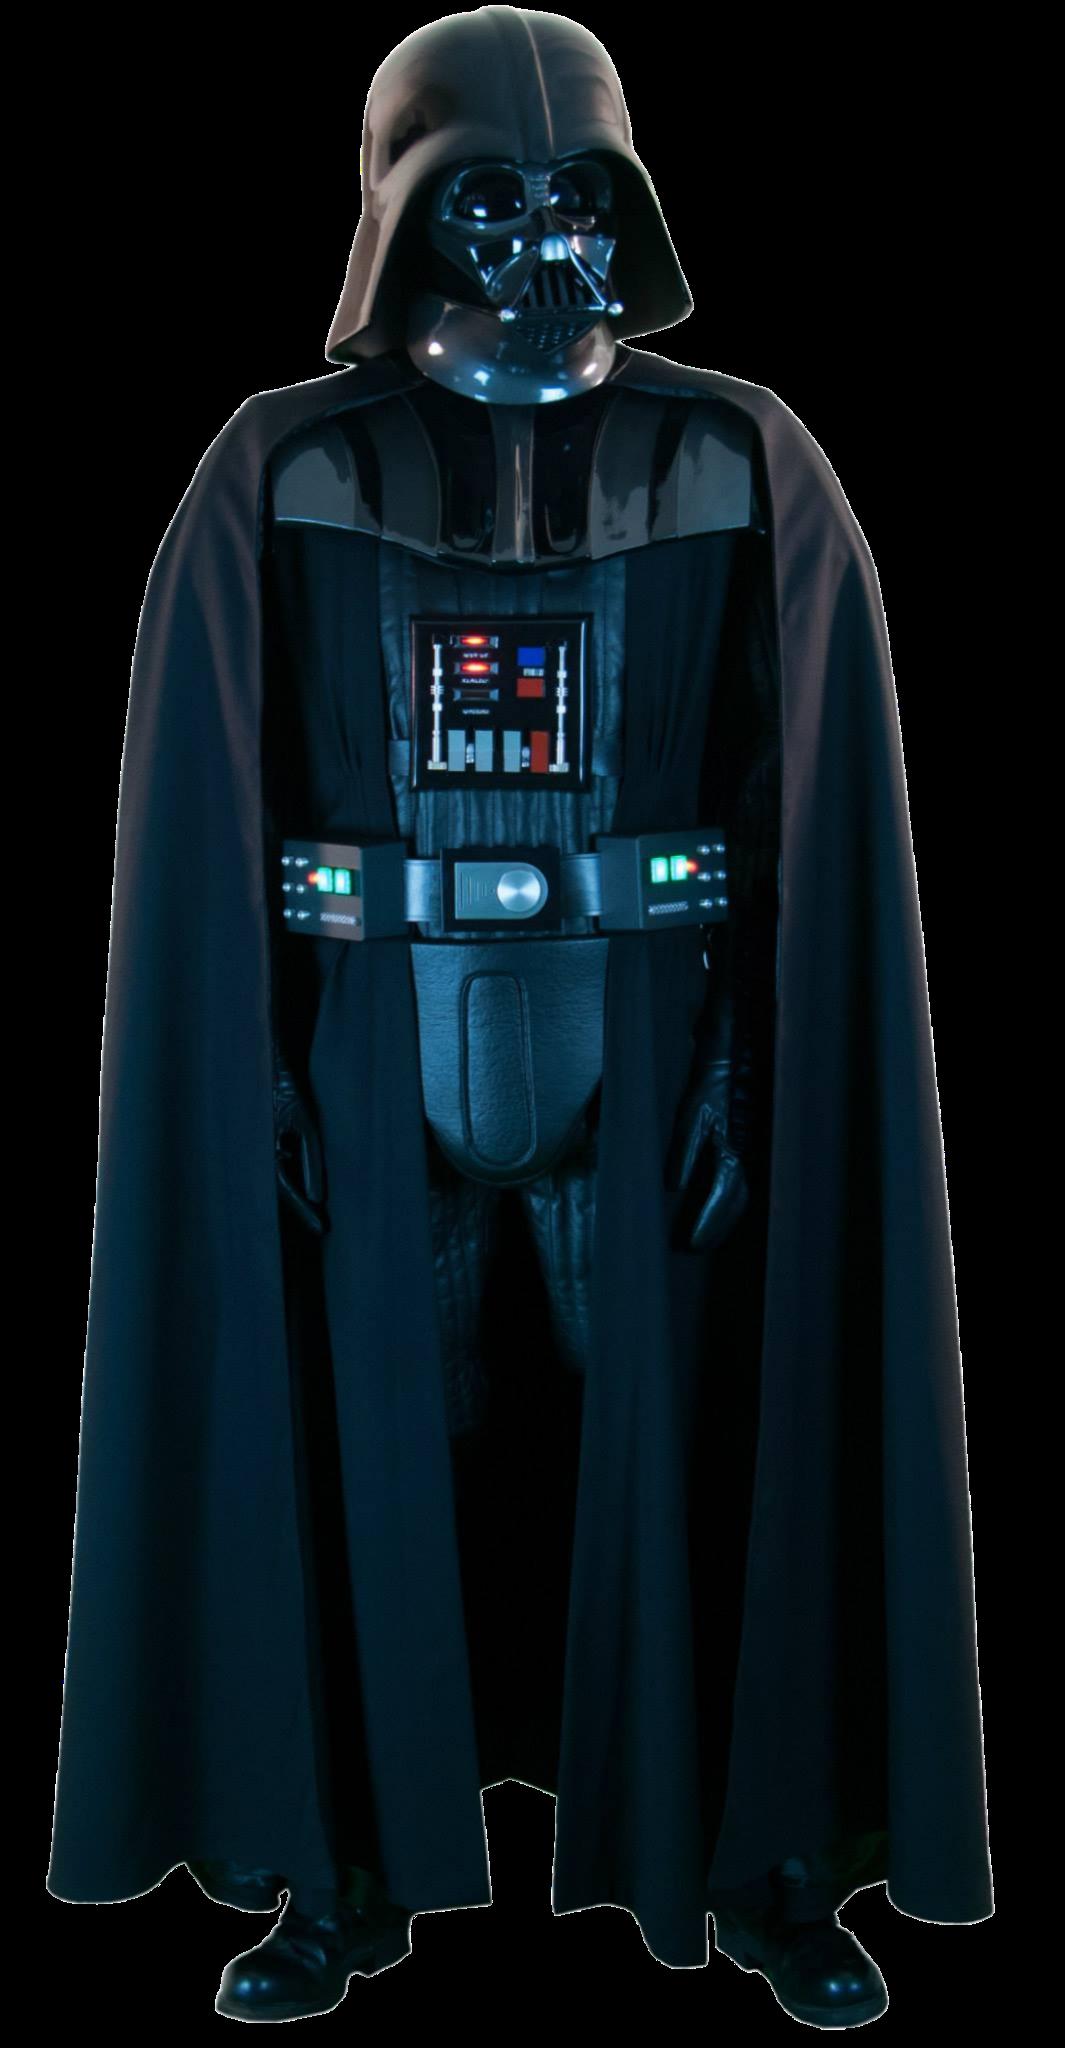 Darth Vaderu0027s armor  sc 1 st  Wookieepedia - Fandom & Darth Vaderu0027s armor | Wookieepedia | FANDOM powered by Wikia